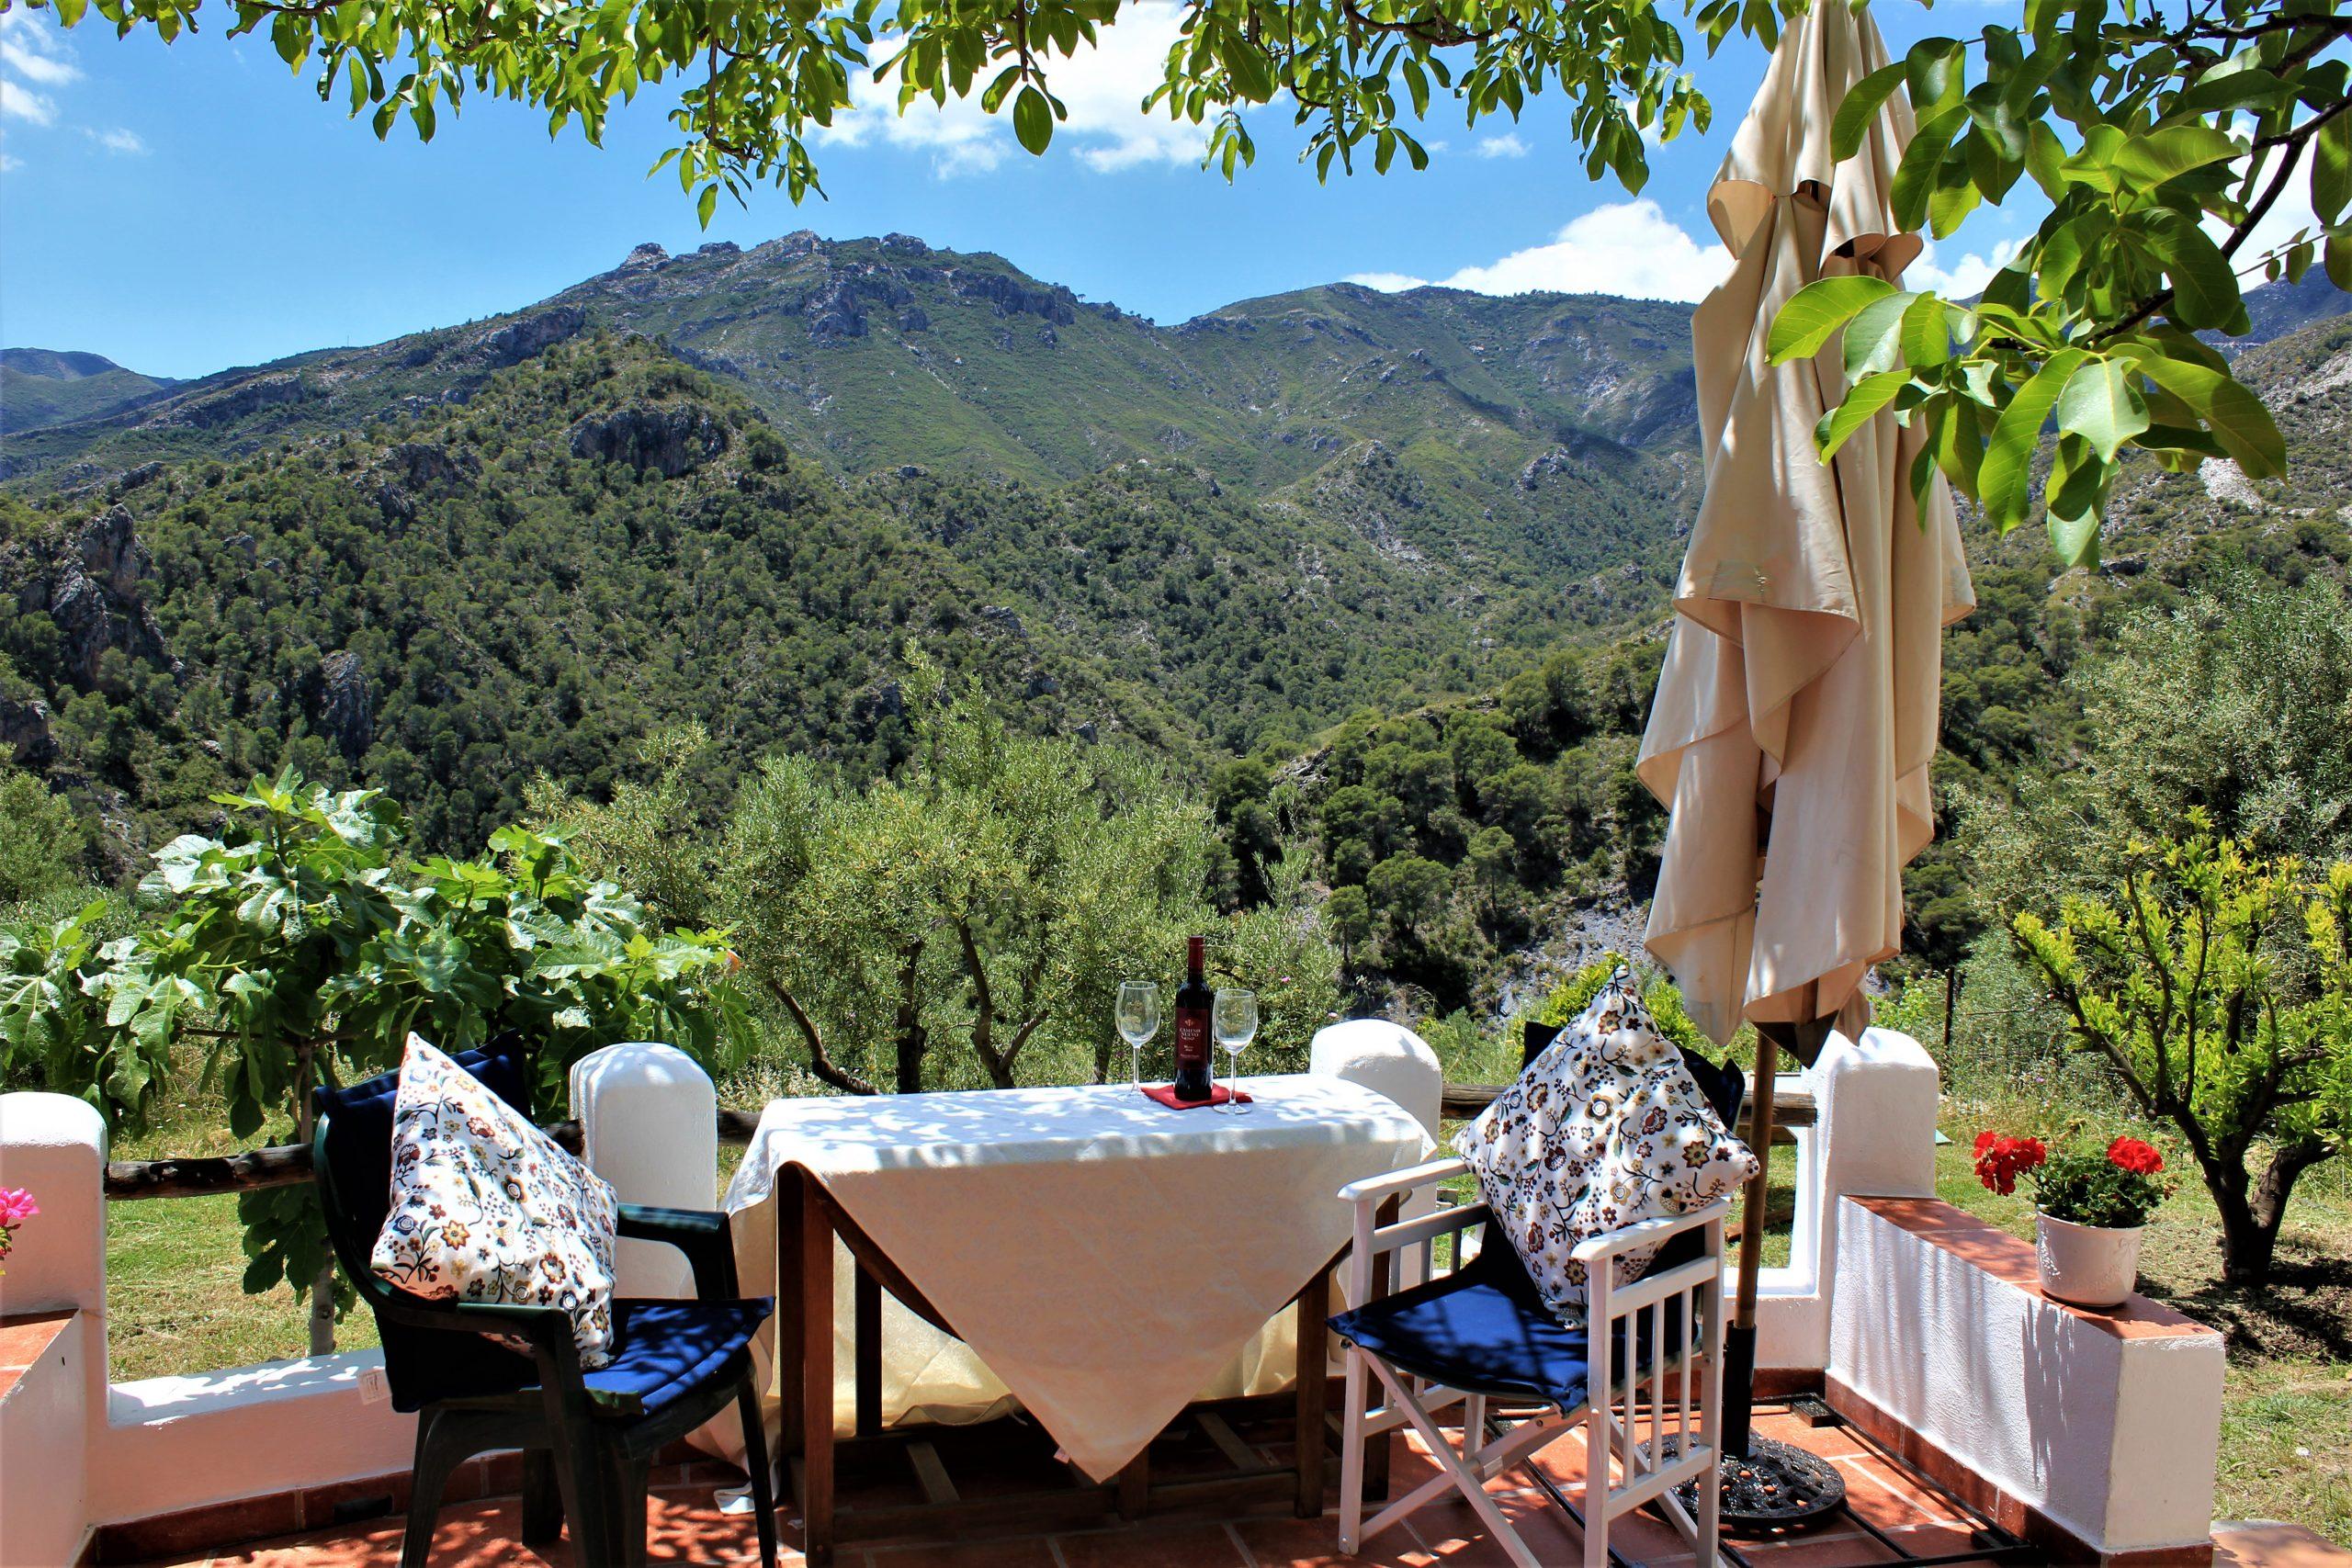 Country Property for Sale in Los Guajares (Granada)